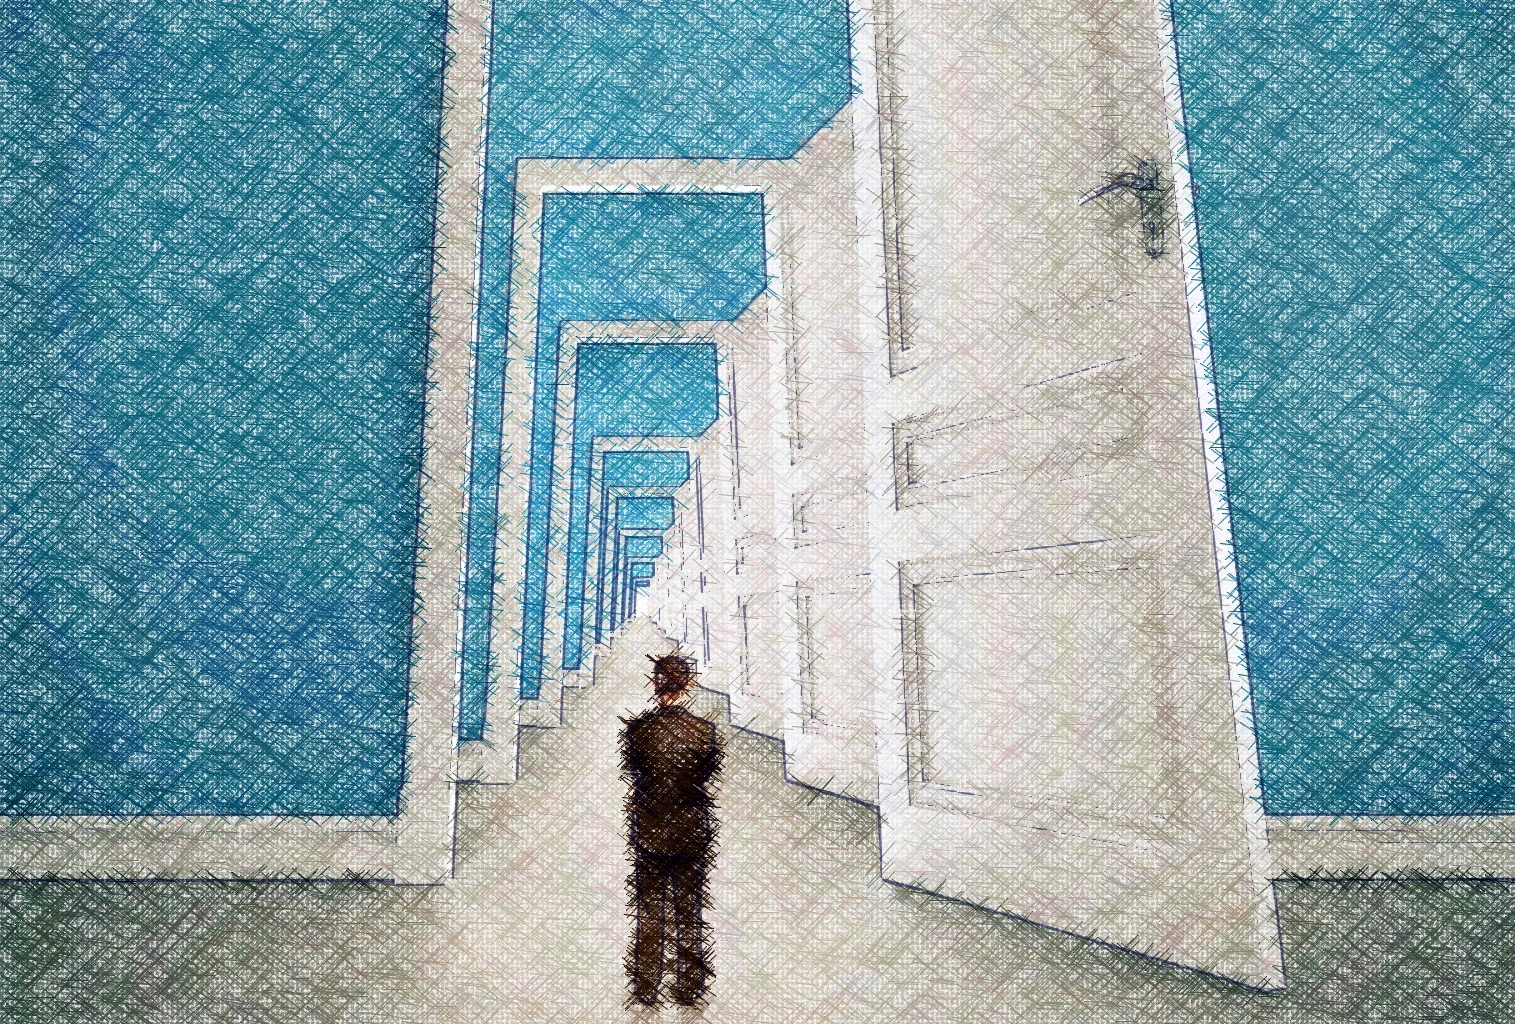 varias puertas que se abren